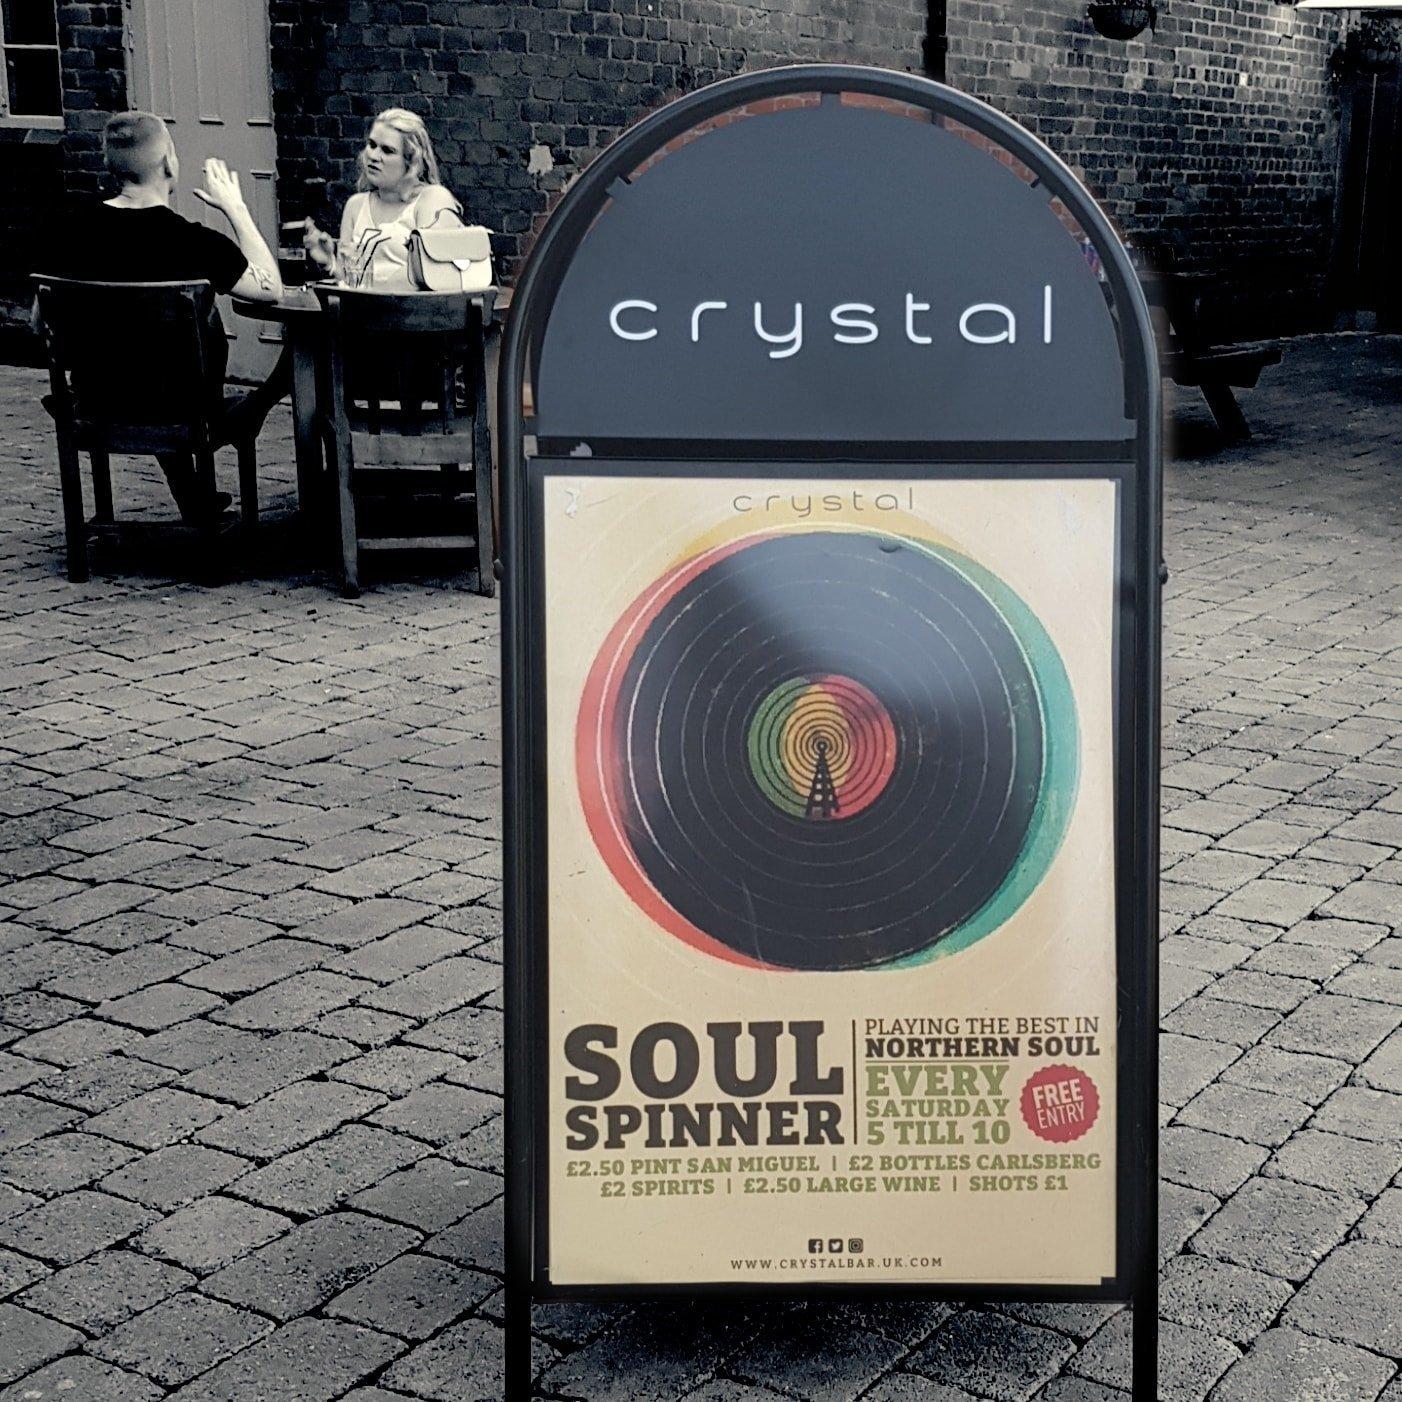 Soul Spinner Bank Holiday Sunday   Crystal  Sheffield flyer